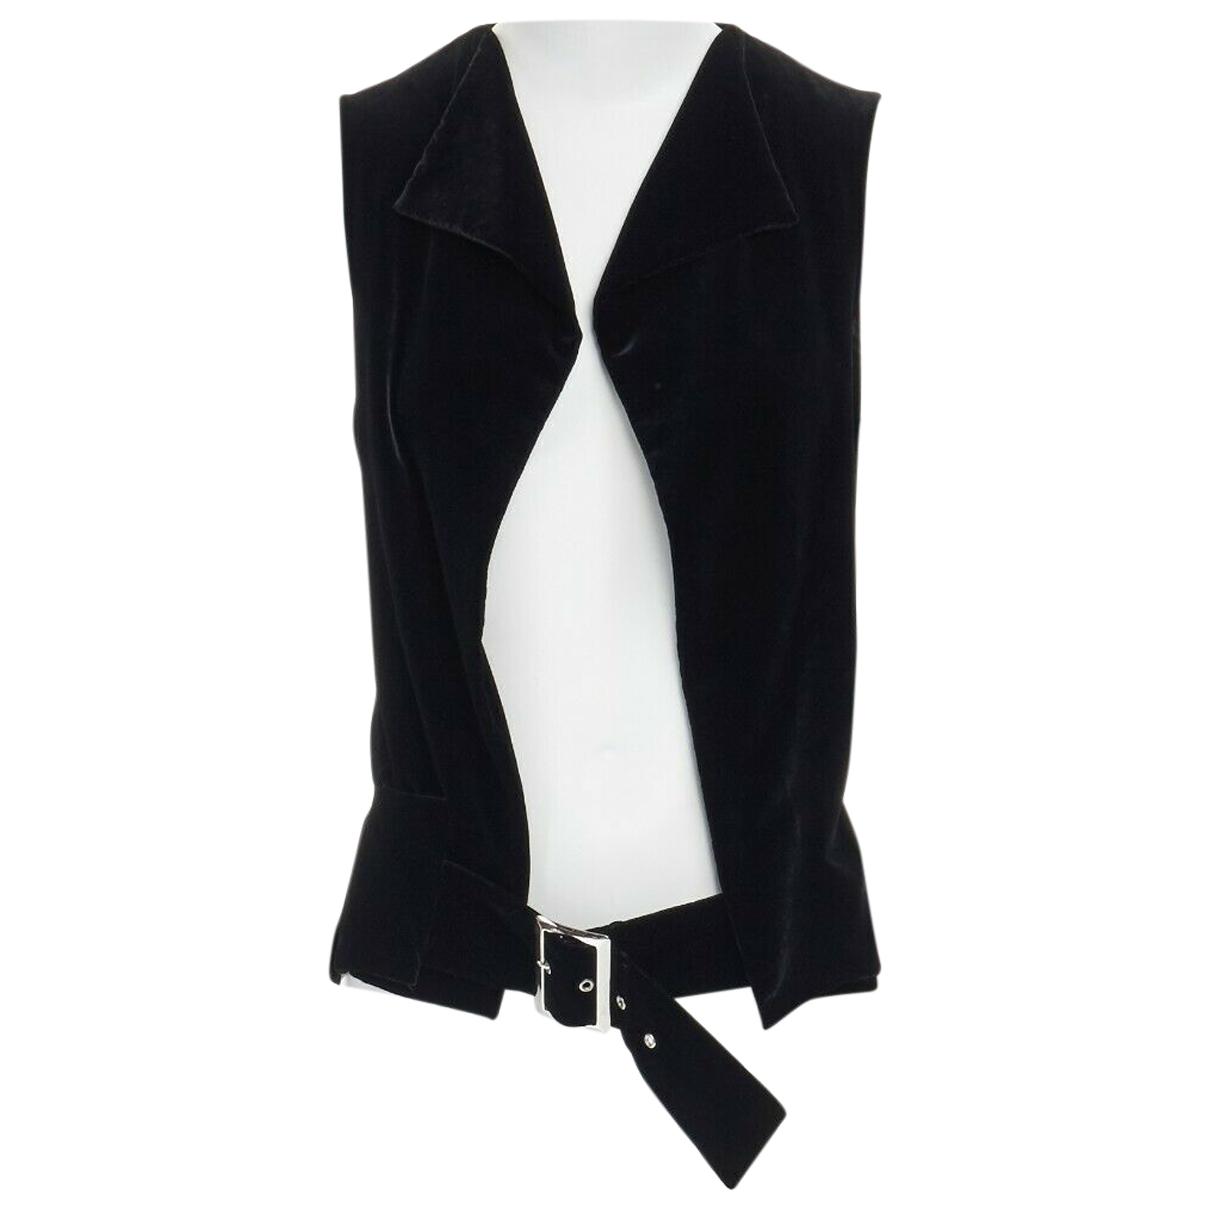 Yohji Yamamoto - Veste   pour femme en velours - noir